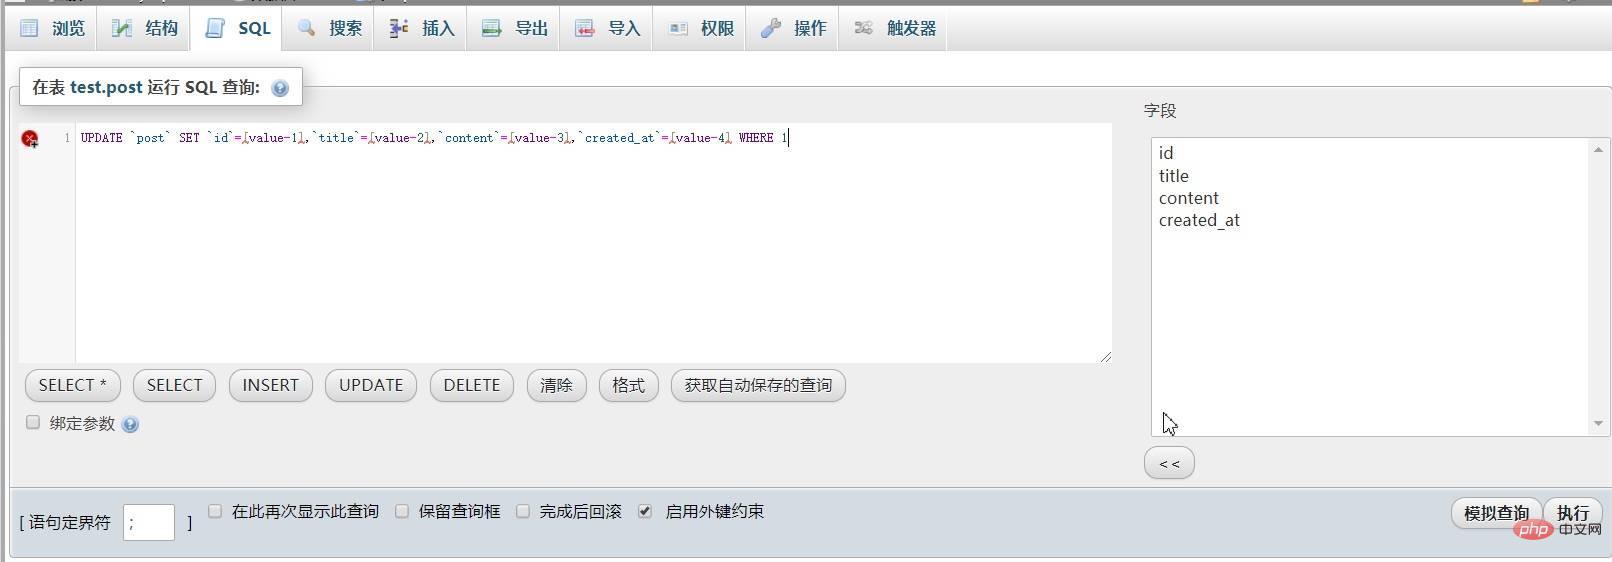 更新SQL语句模板